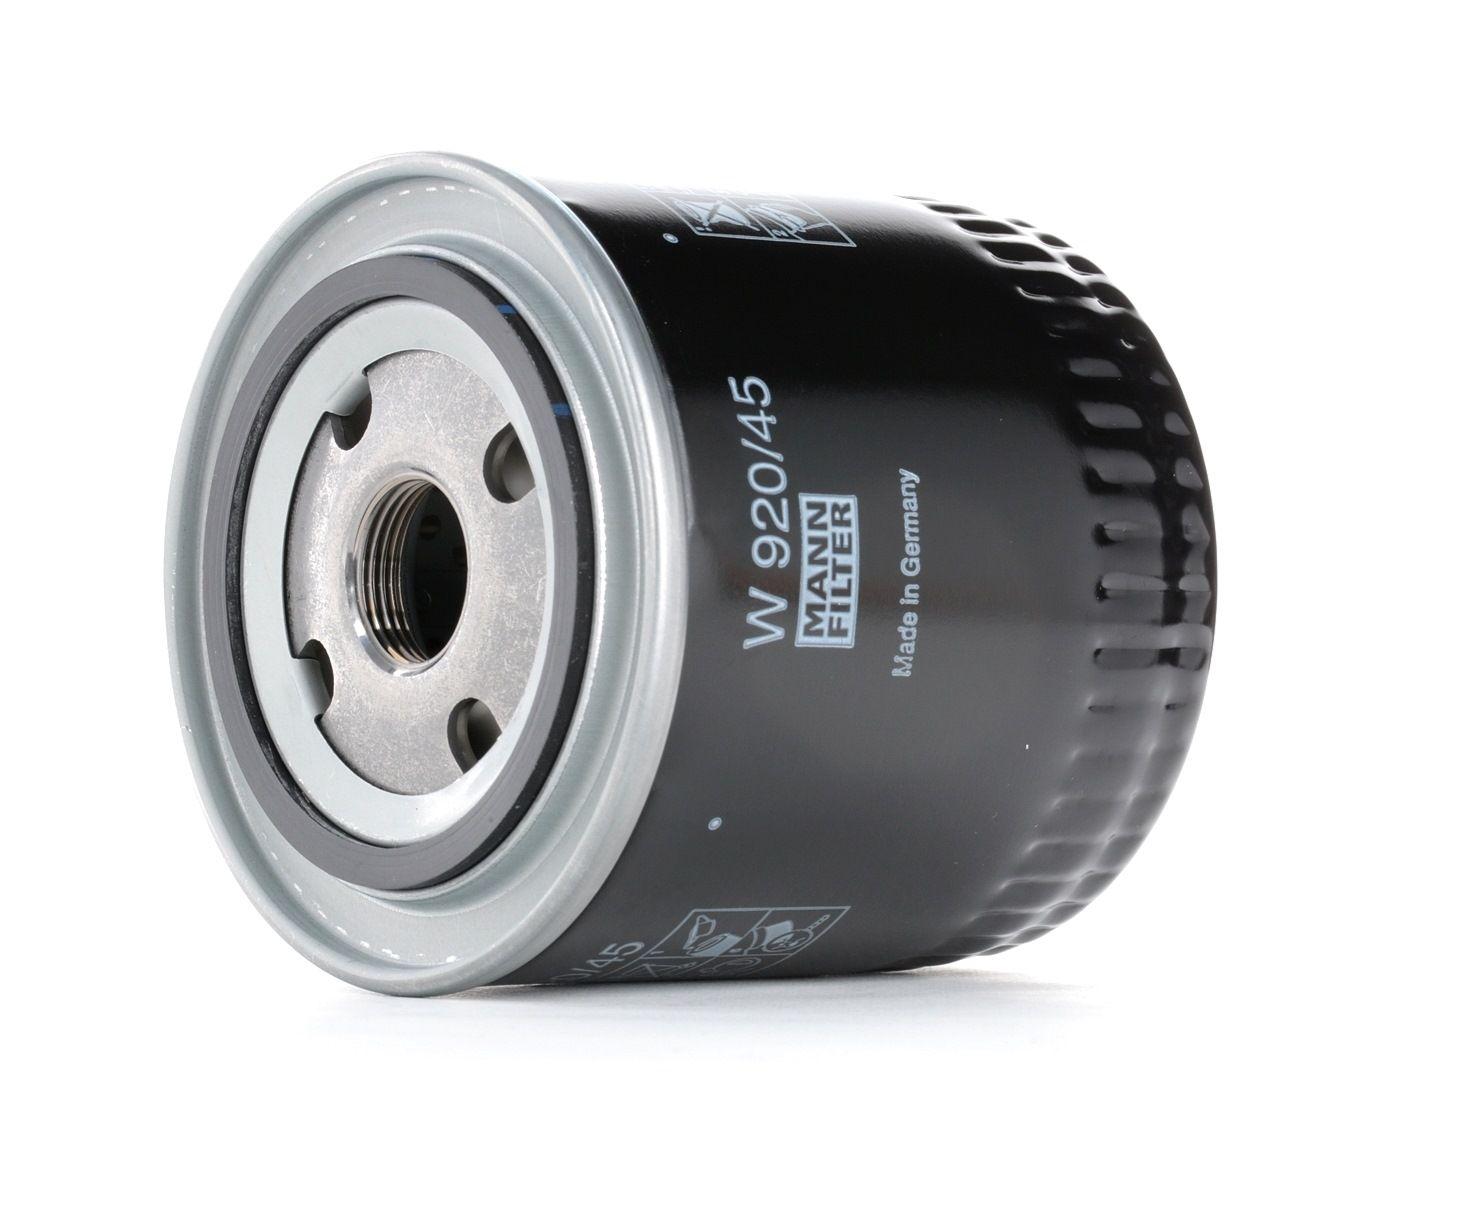 MANN-FILTER: Original Motorölfilter W 920/45 (Innendurchmesser 2: 62mm, Innendurchmesser 2: 62mm, Ø: 93mm, Außendurchmesser 2: 71mm, Höhe: 95mm)